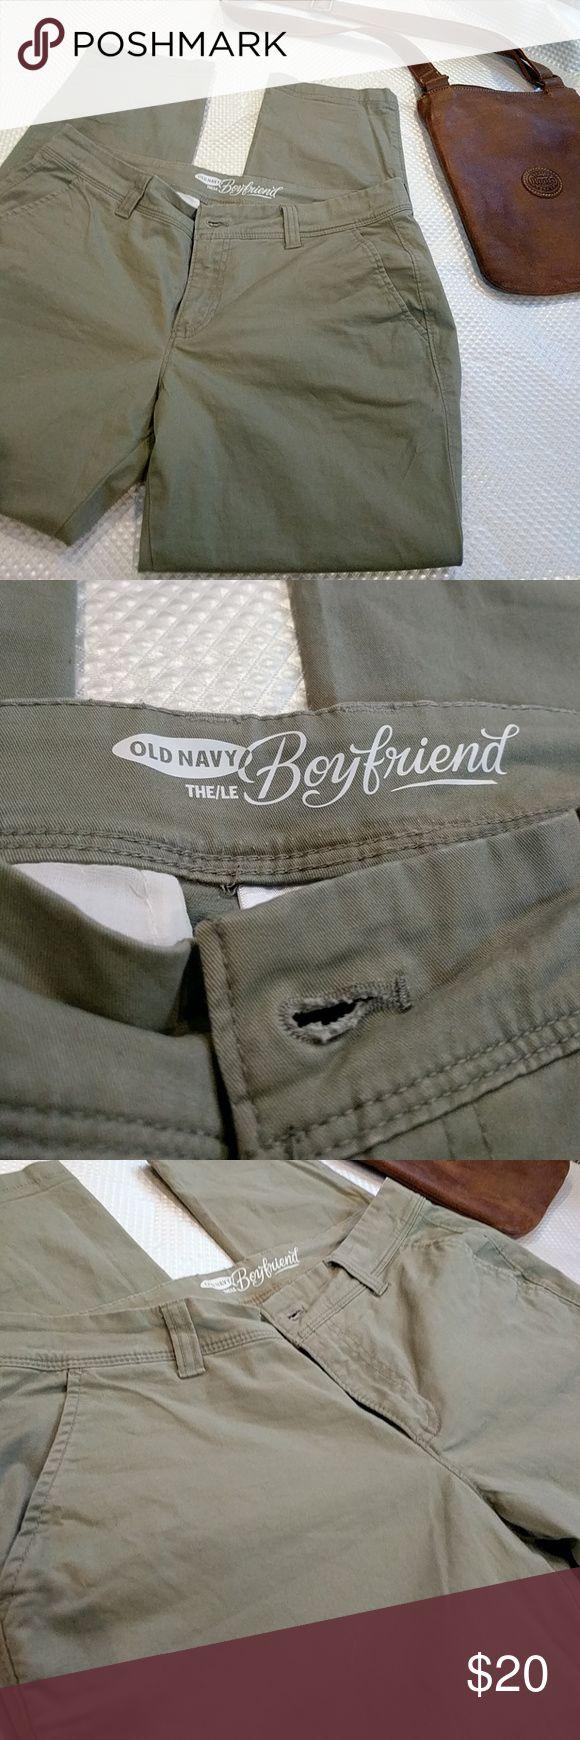 Old Navy Boyfriend Style Pants Old Navy Boyfriend Style Pants Khaki Green Old Navy Pants